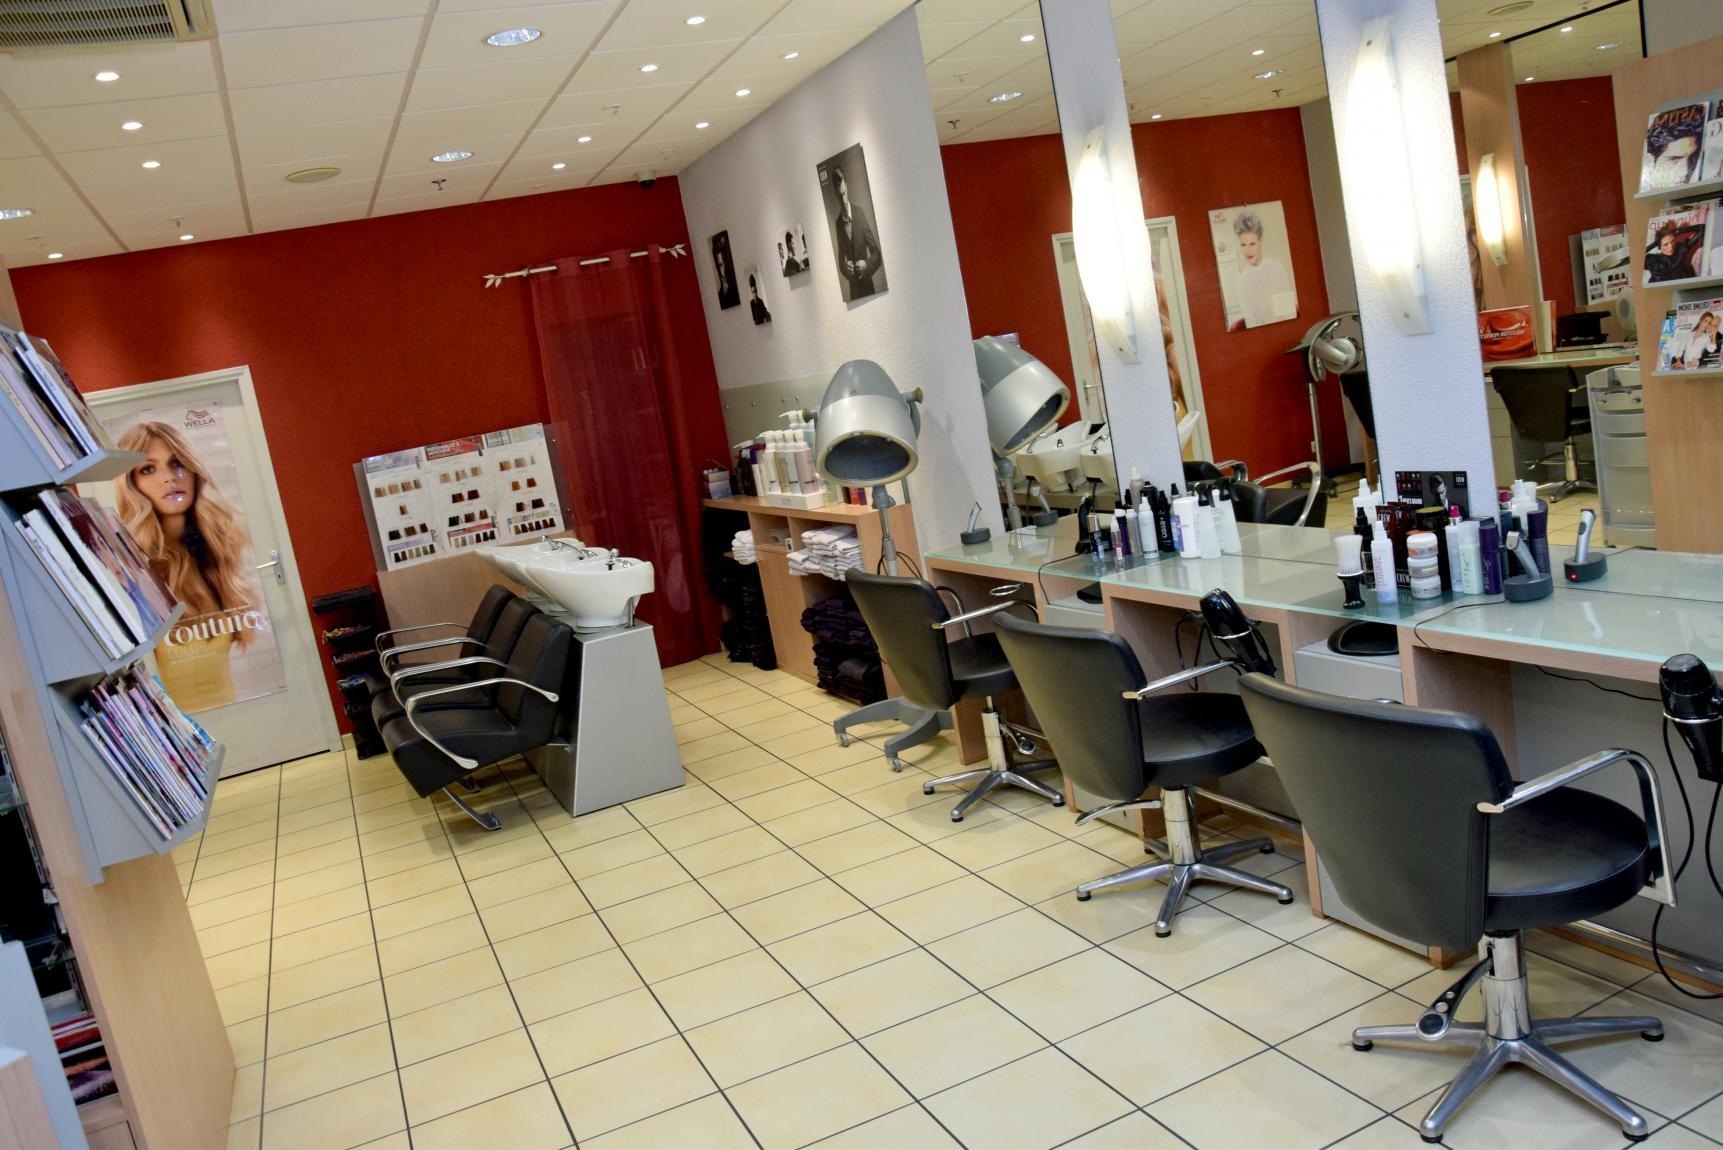 aromatic r dijon espace beaut salon de coiffure. Black Bedroom Furniture Sets. Home Design Ideas